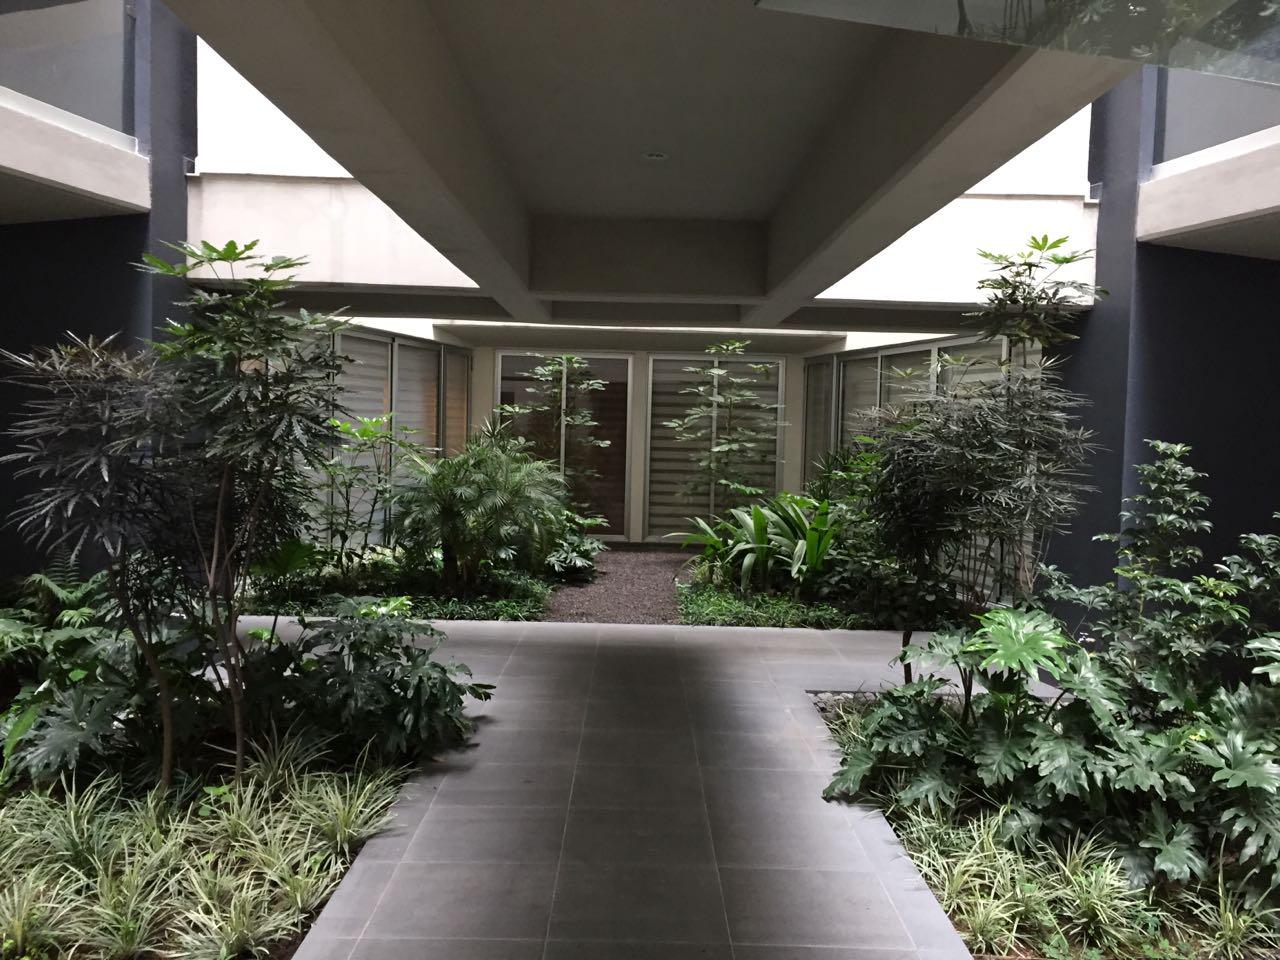 Edificio de vivienda interior